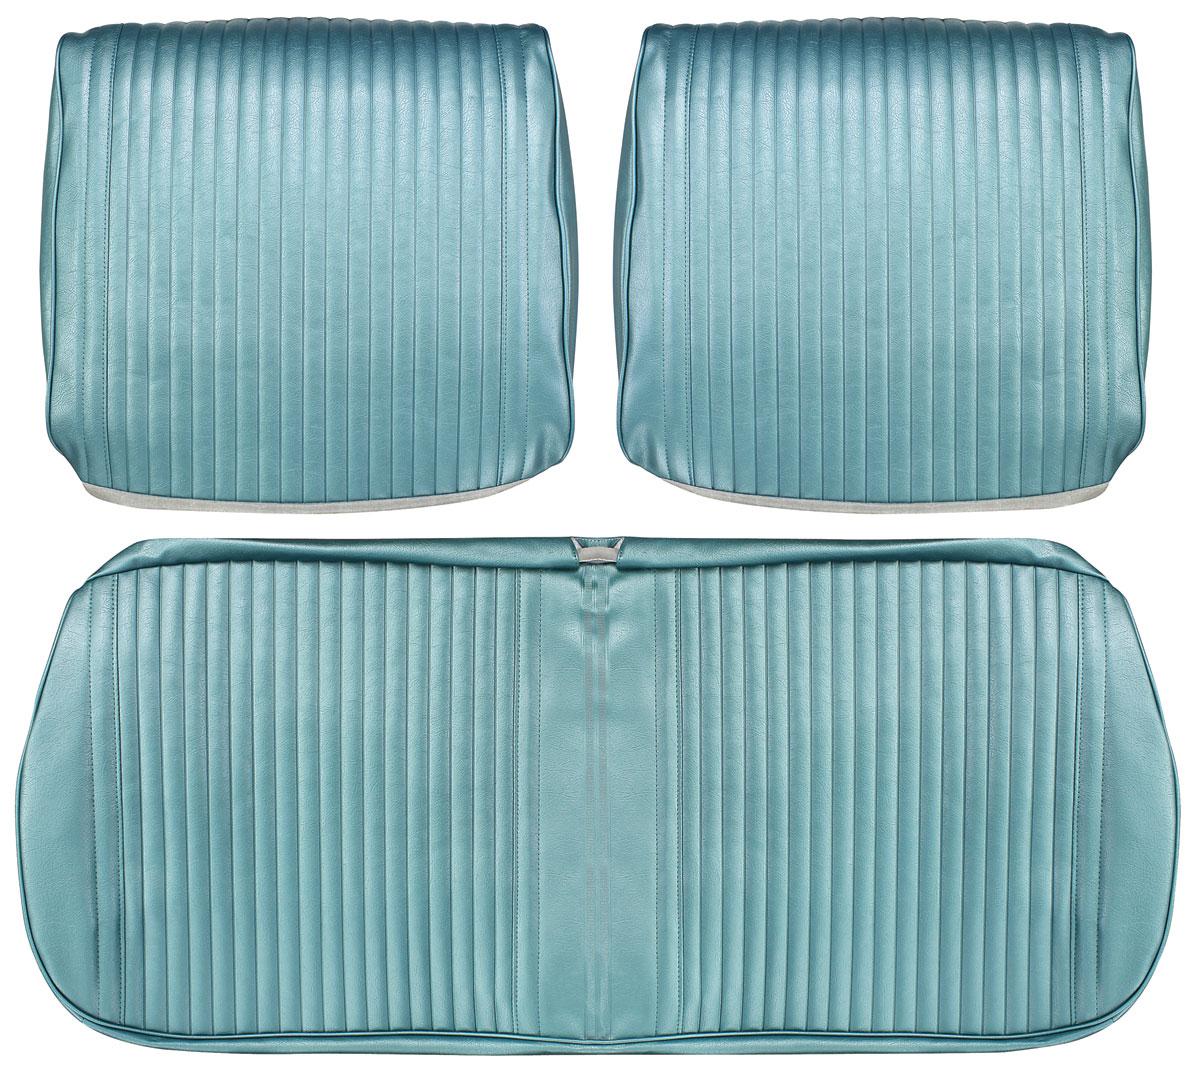 Pui El Camino Seat Upholstery 1964 Reproduction Vinyl Split Bench